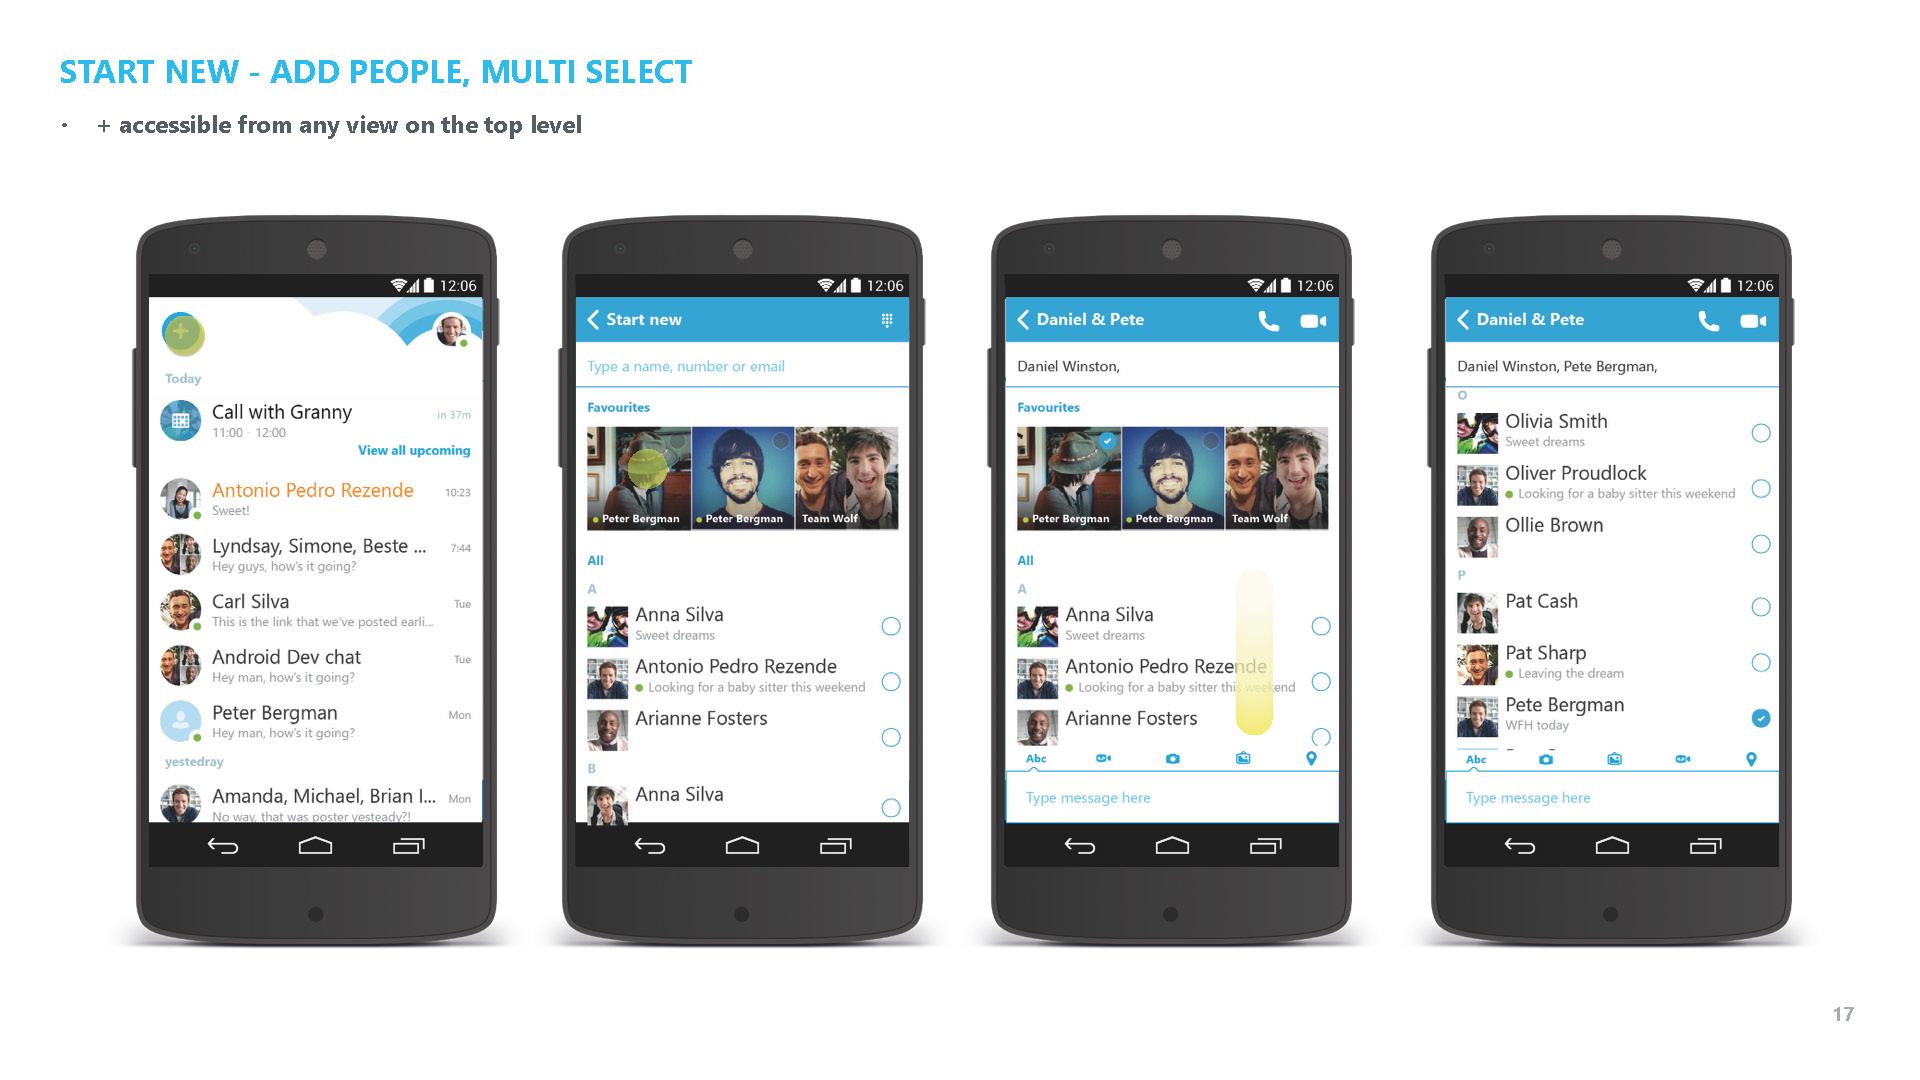 Mobile_UI_model_Page_17.jpg